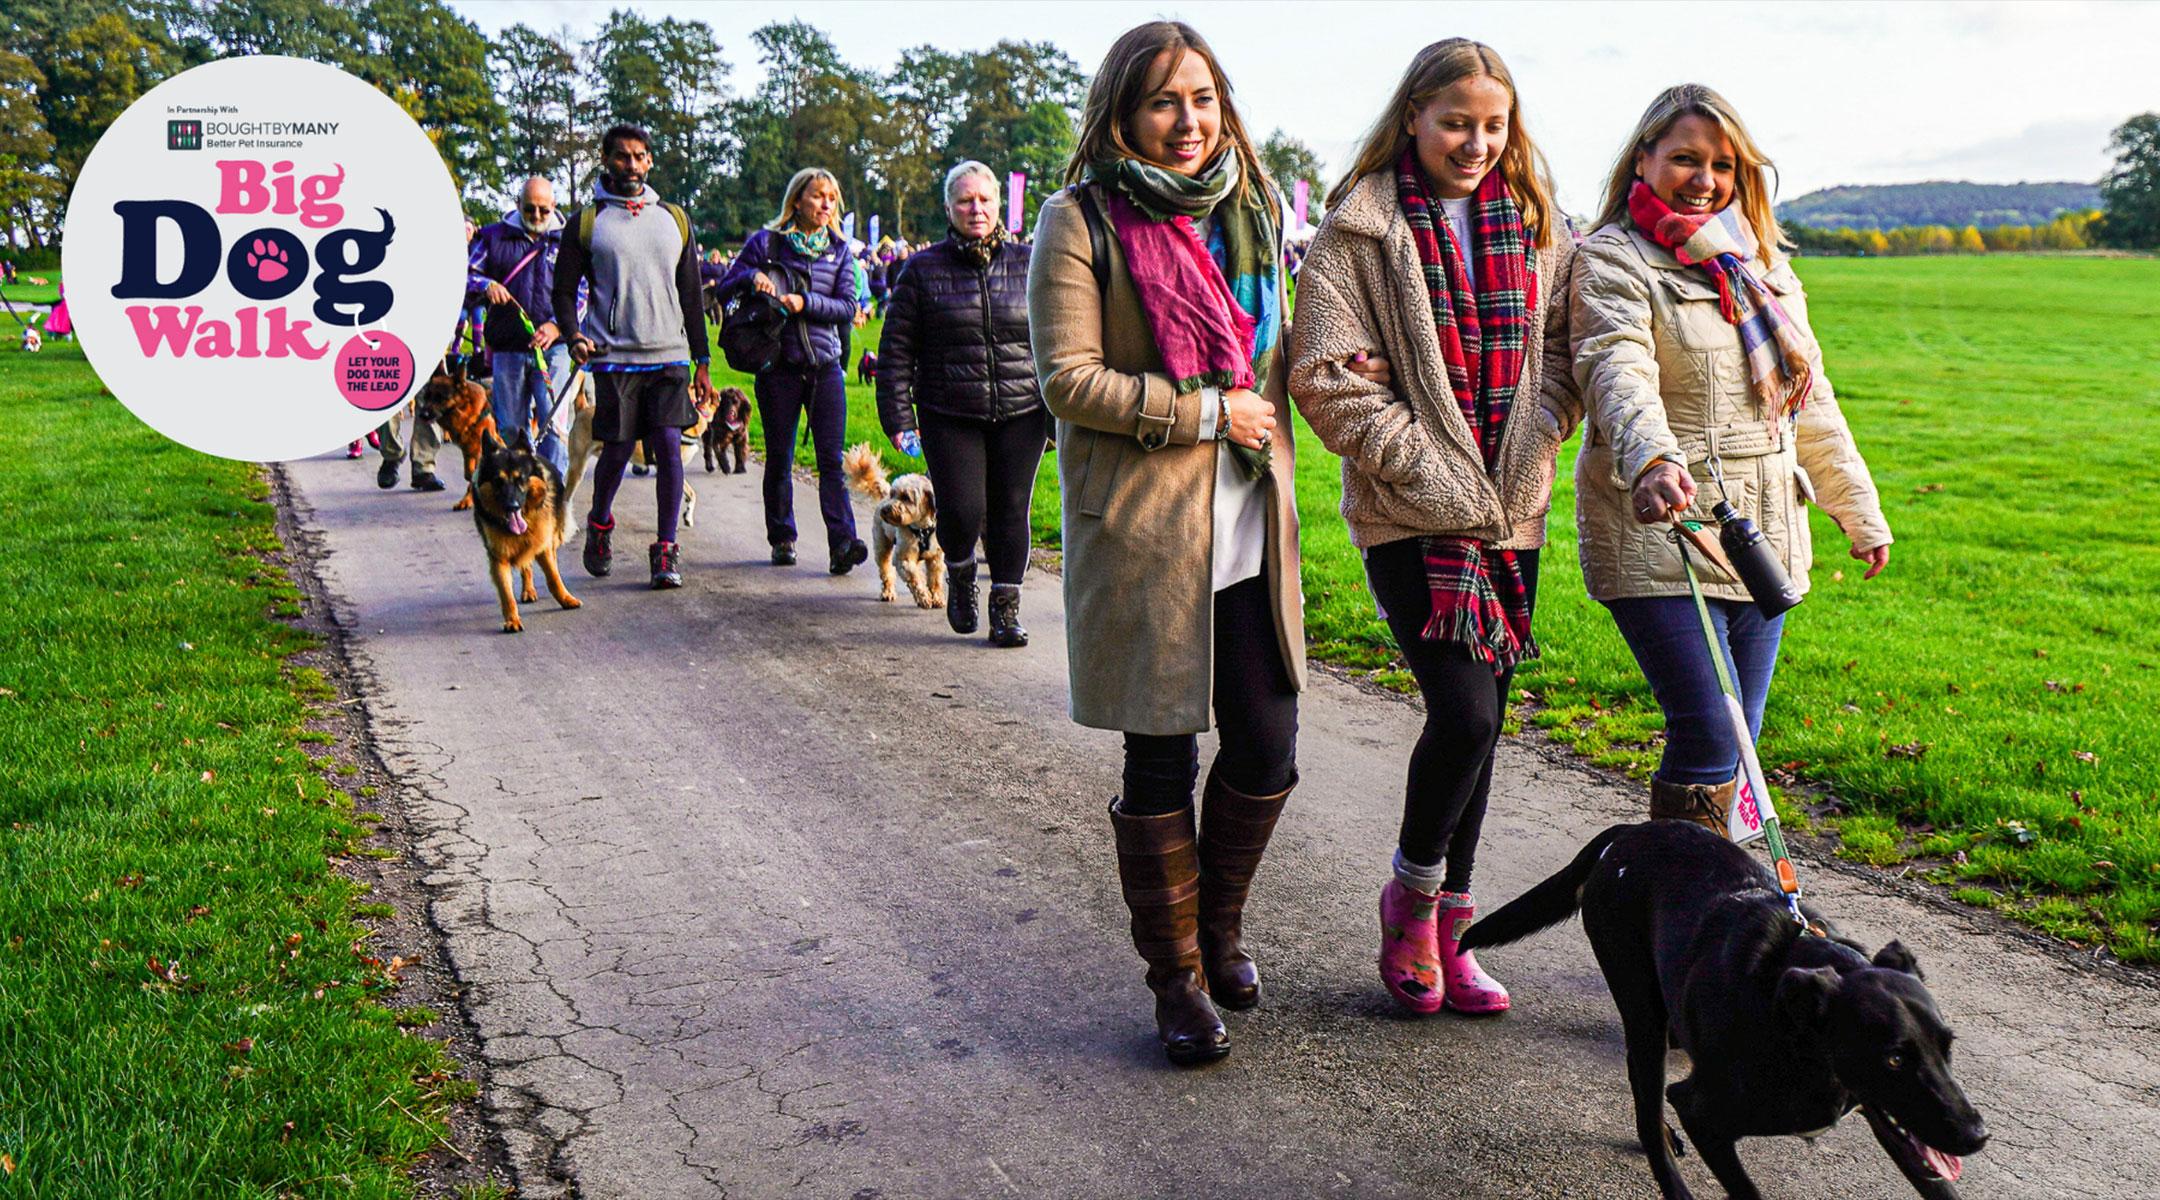 Big Dog Walk Essex